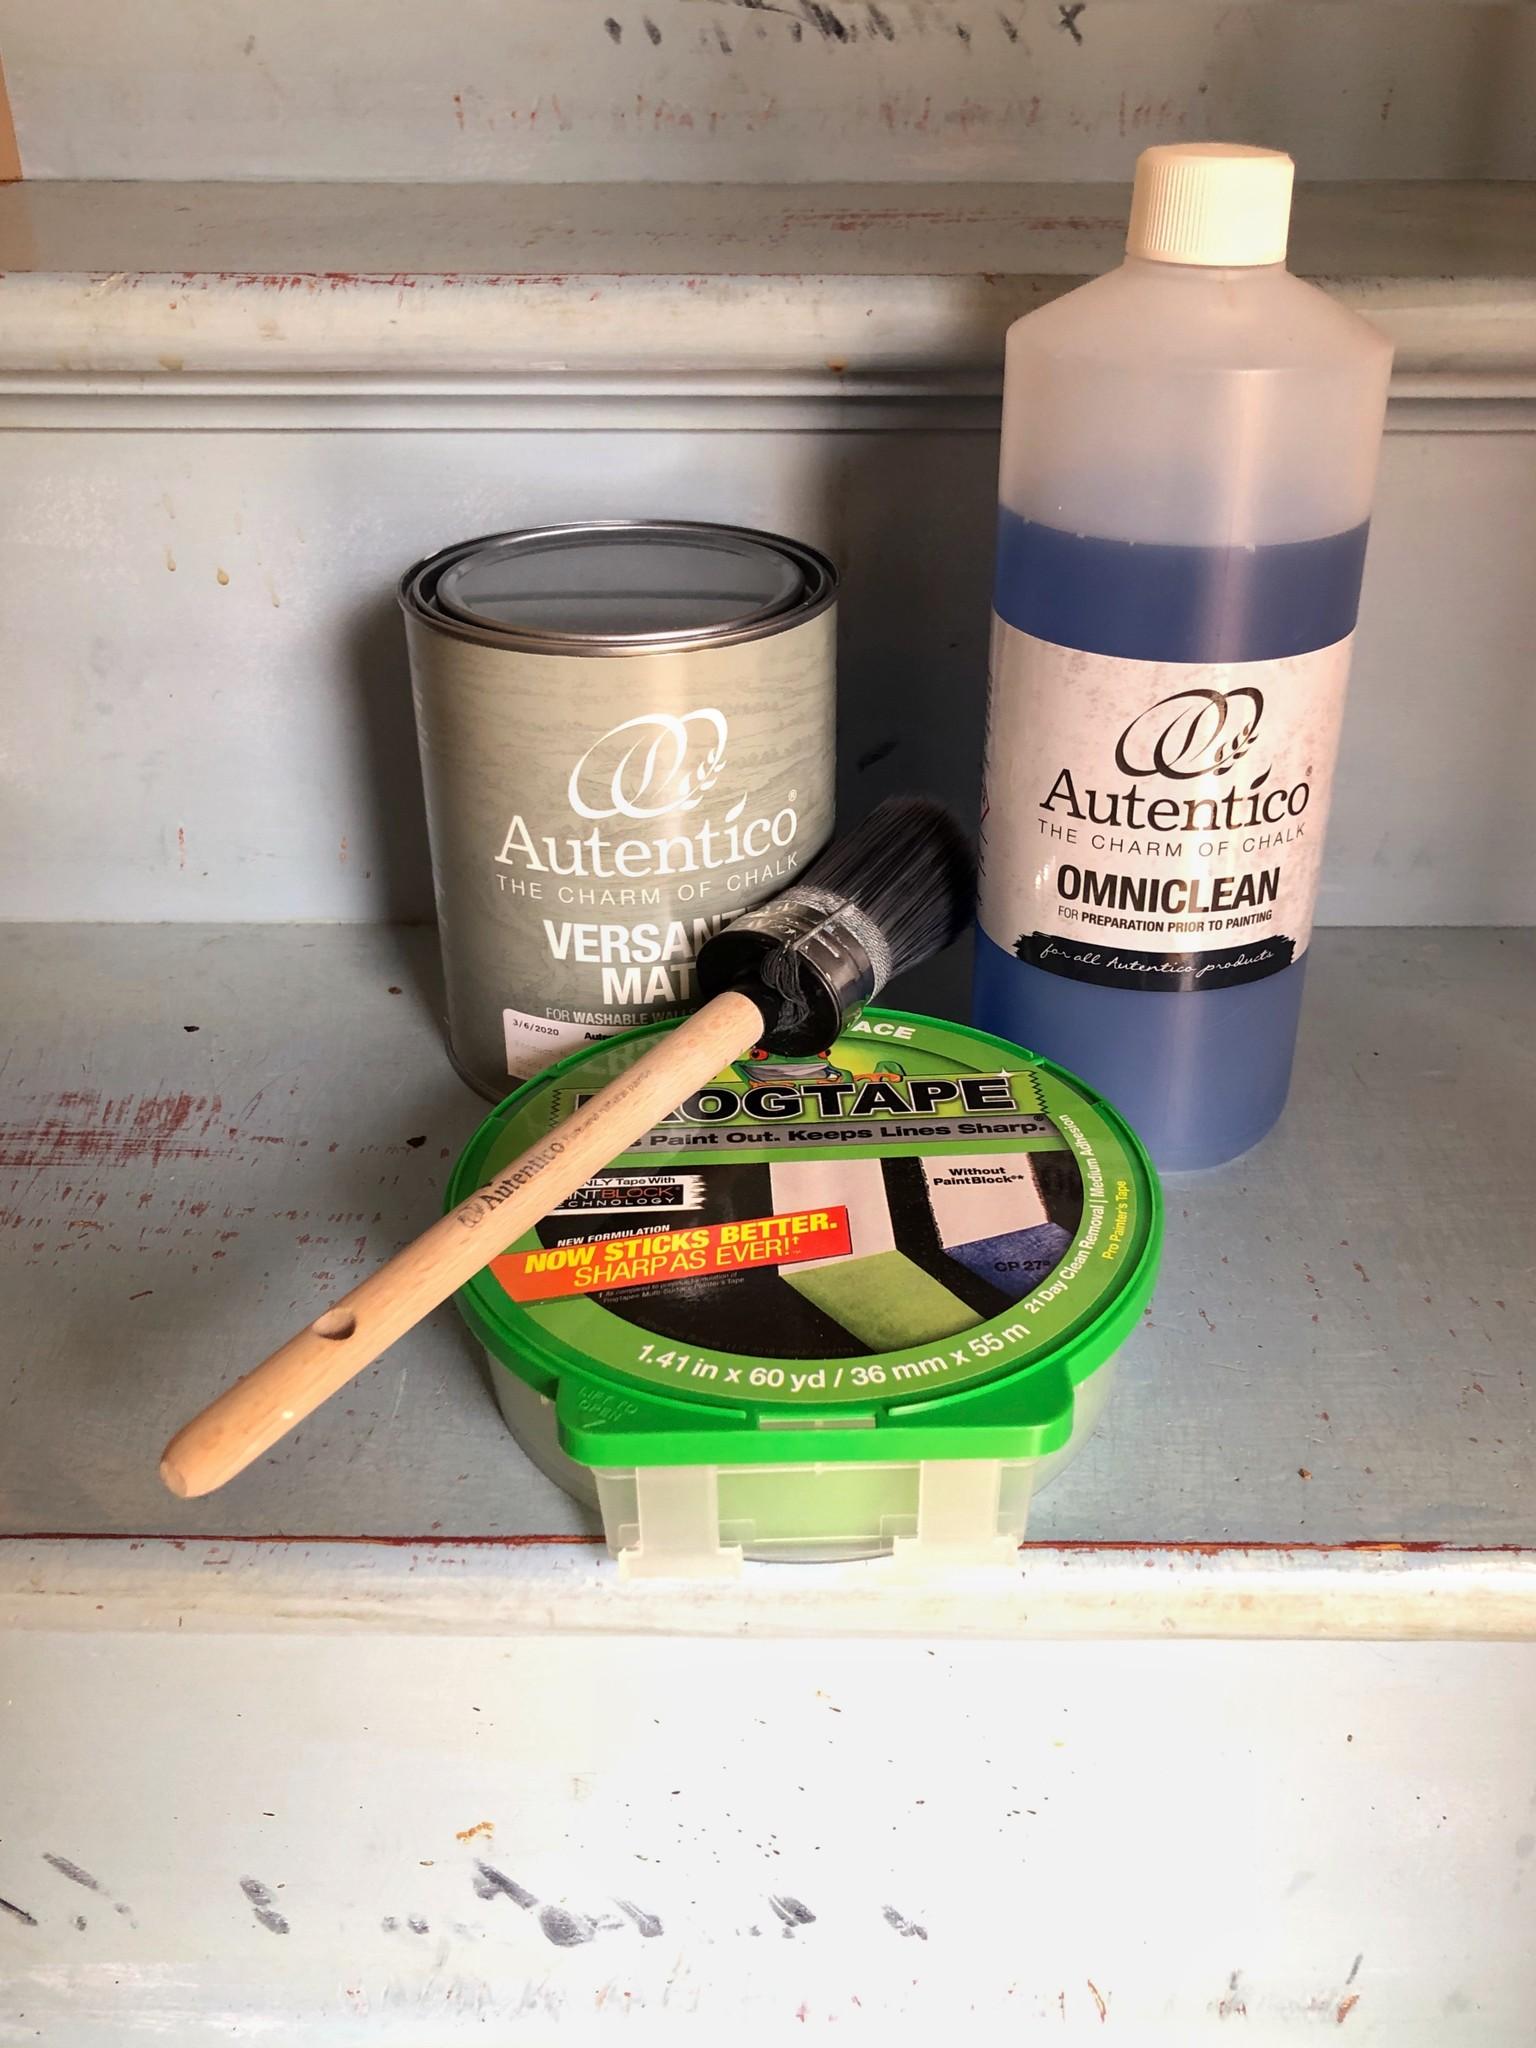 Onmiclean, Frog Tape, 35mm brush